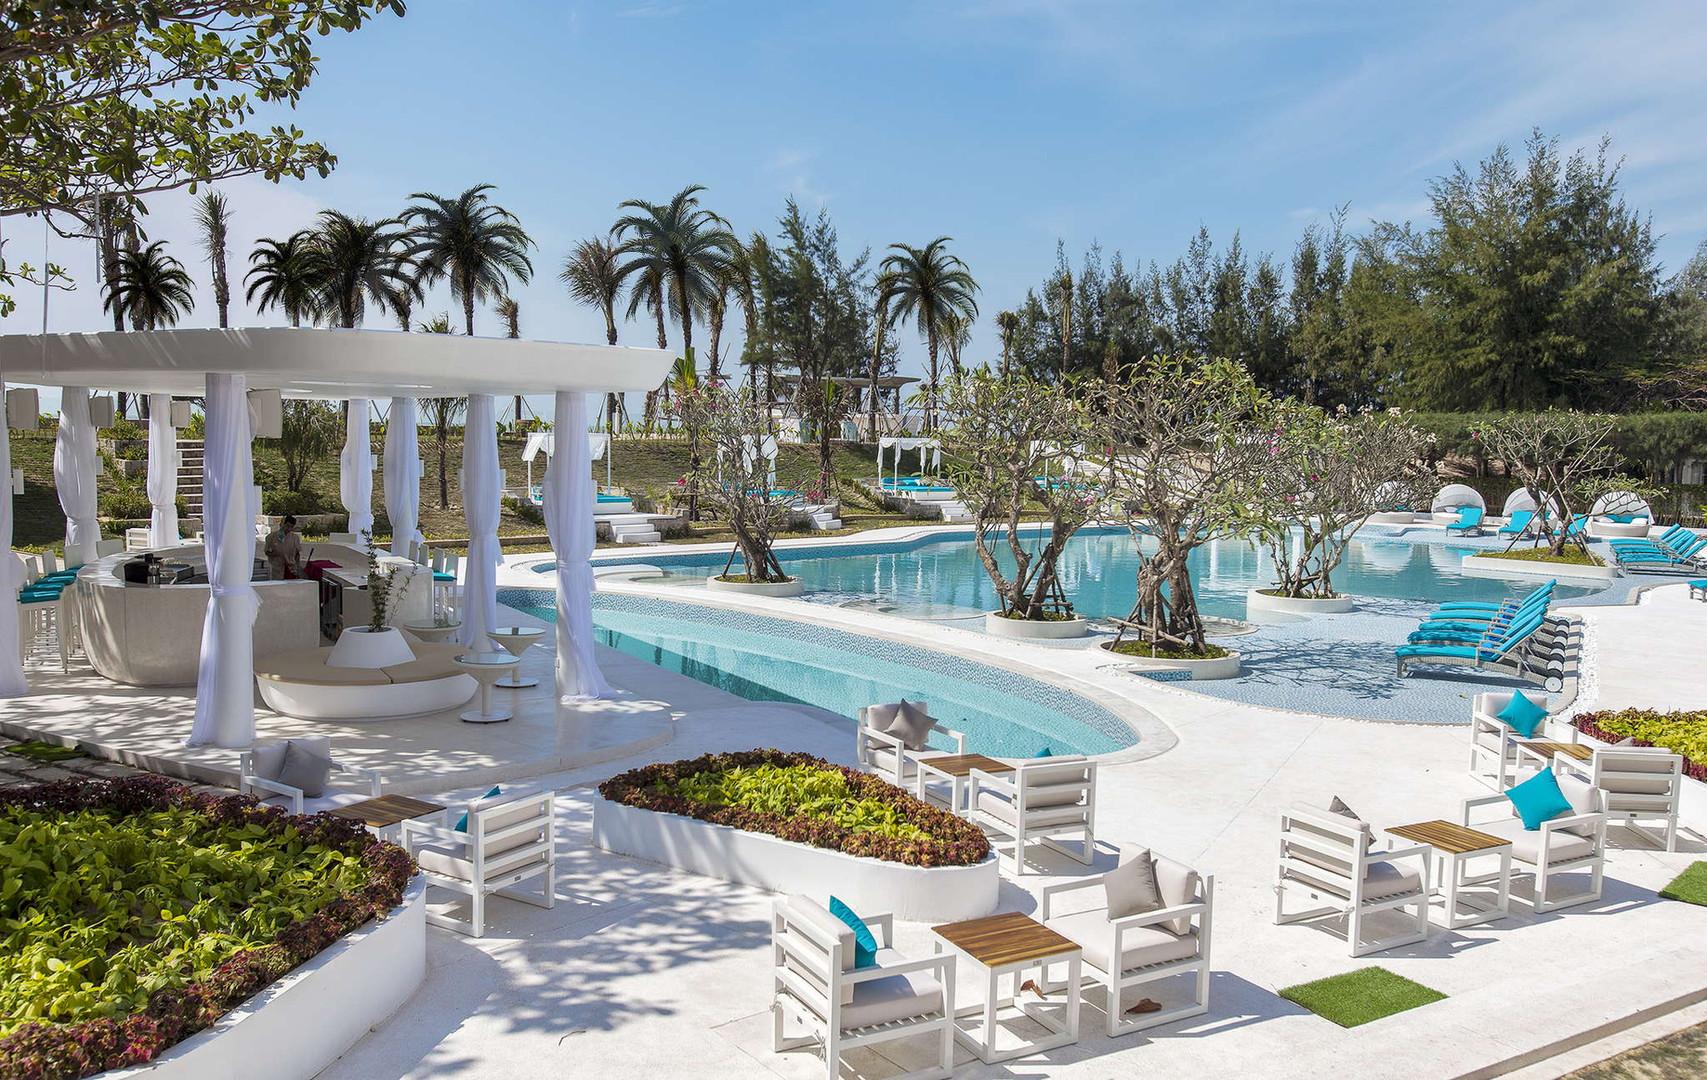 Anoasis Resort